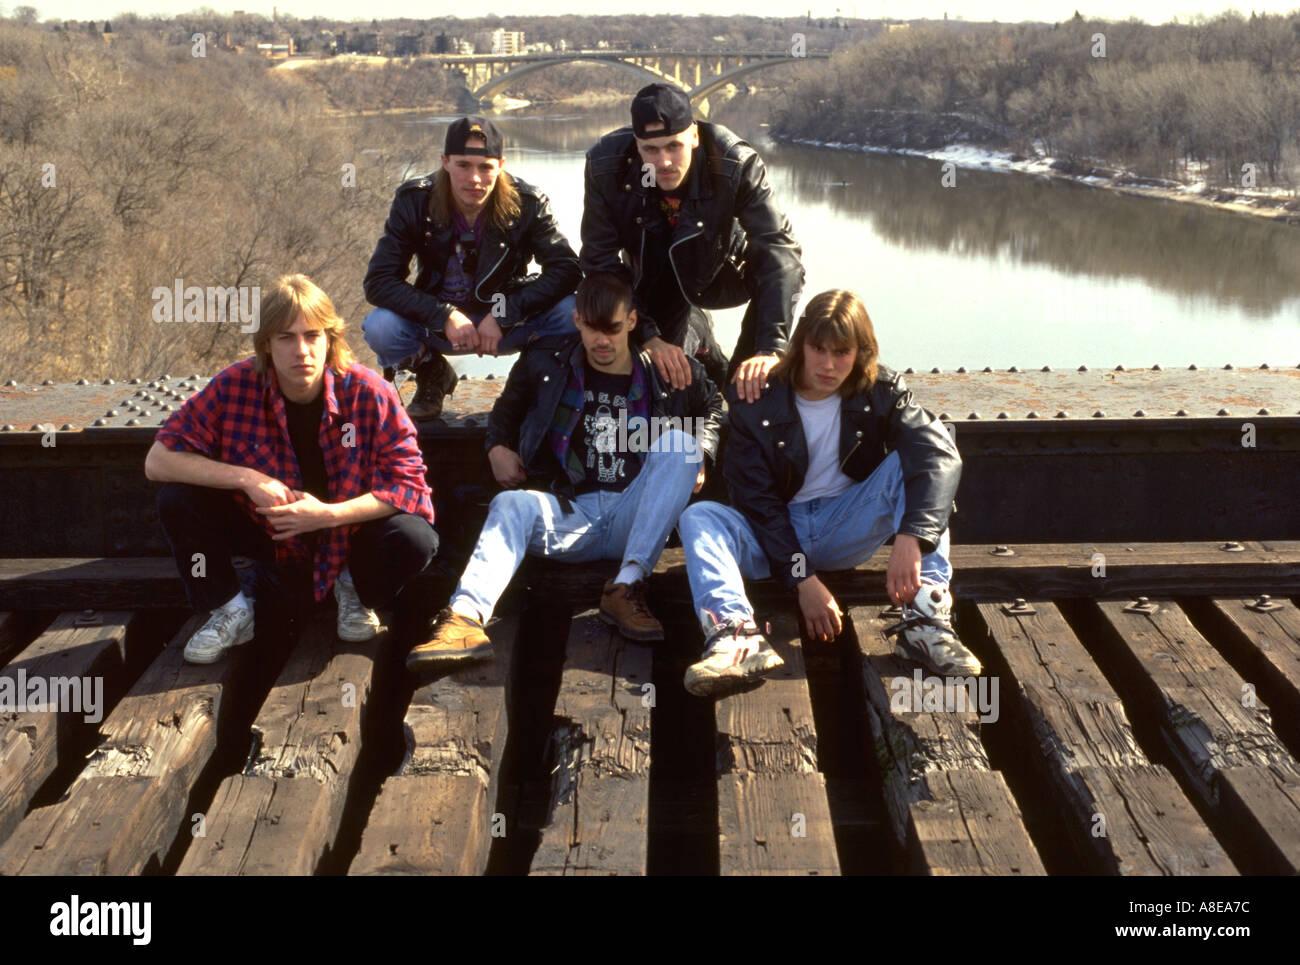 Members of rock band ages 18 thru 20 sitting on railroad bridge. St Paul Minnesota USA - Stock Image